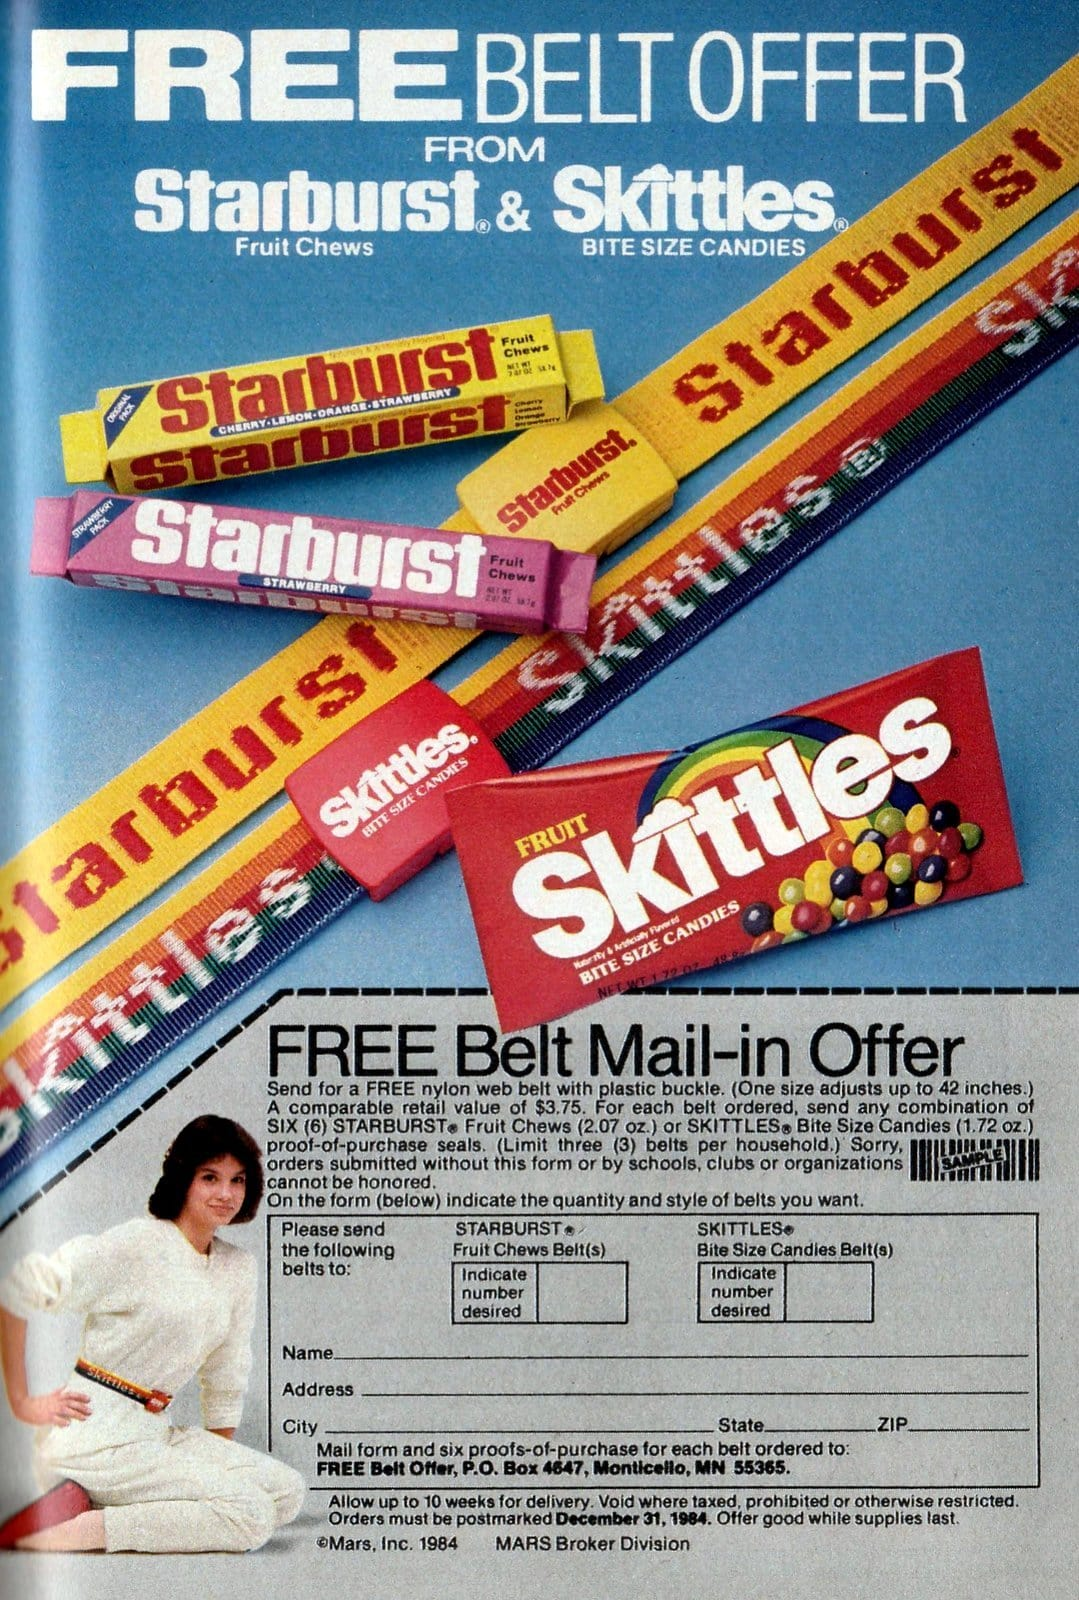 Starburst and Skittles belts